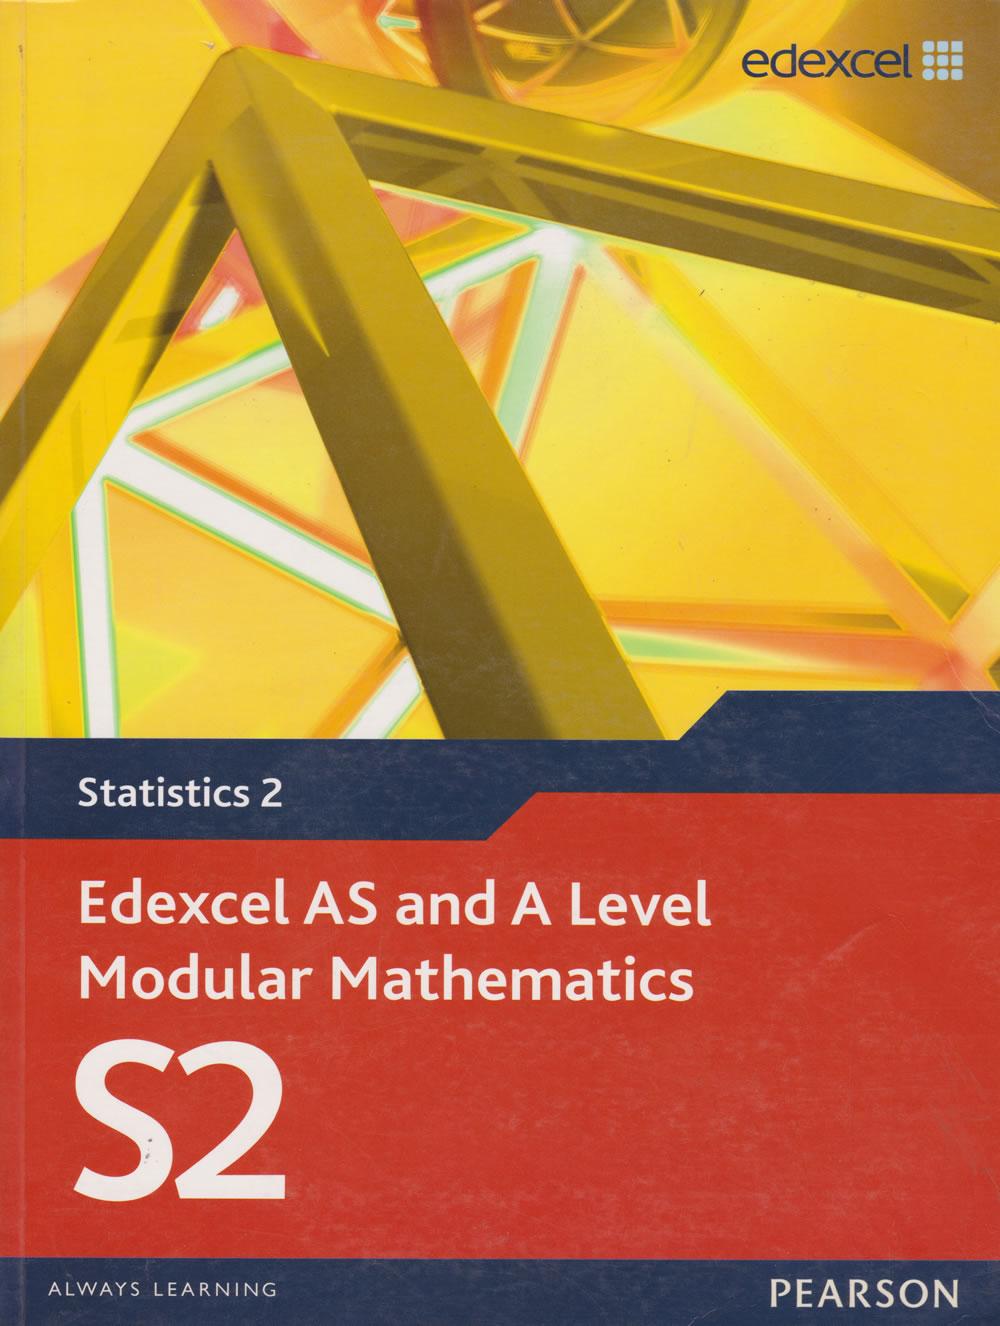 Statistics 2 Edexcel AS and A Level Modular Mathematics